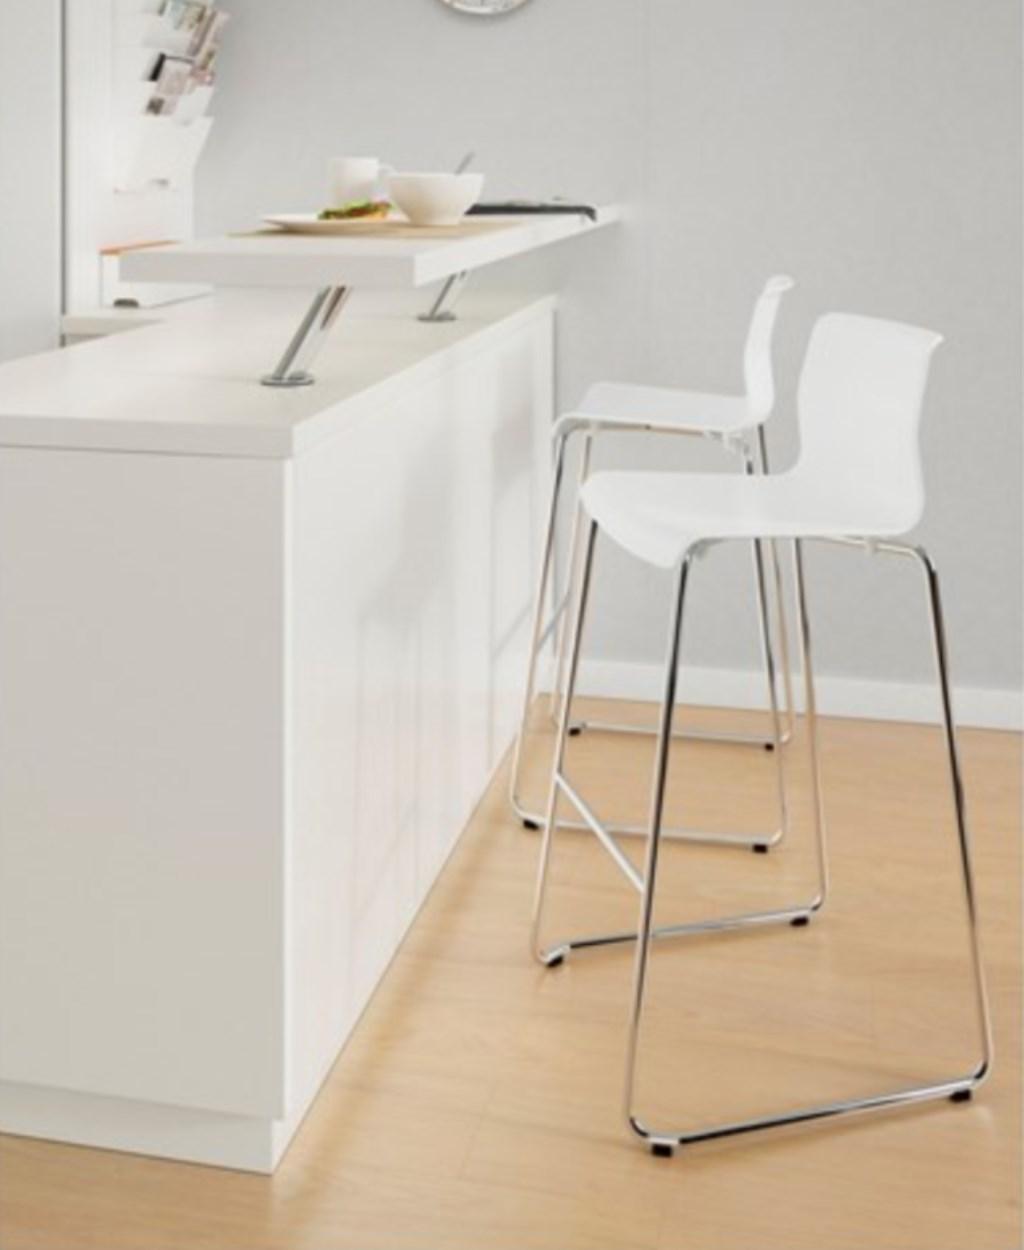 Beyaz Ikea Ikea Glenn Bar Taburesi Yeni Gibi Tabure